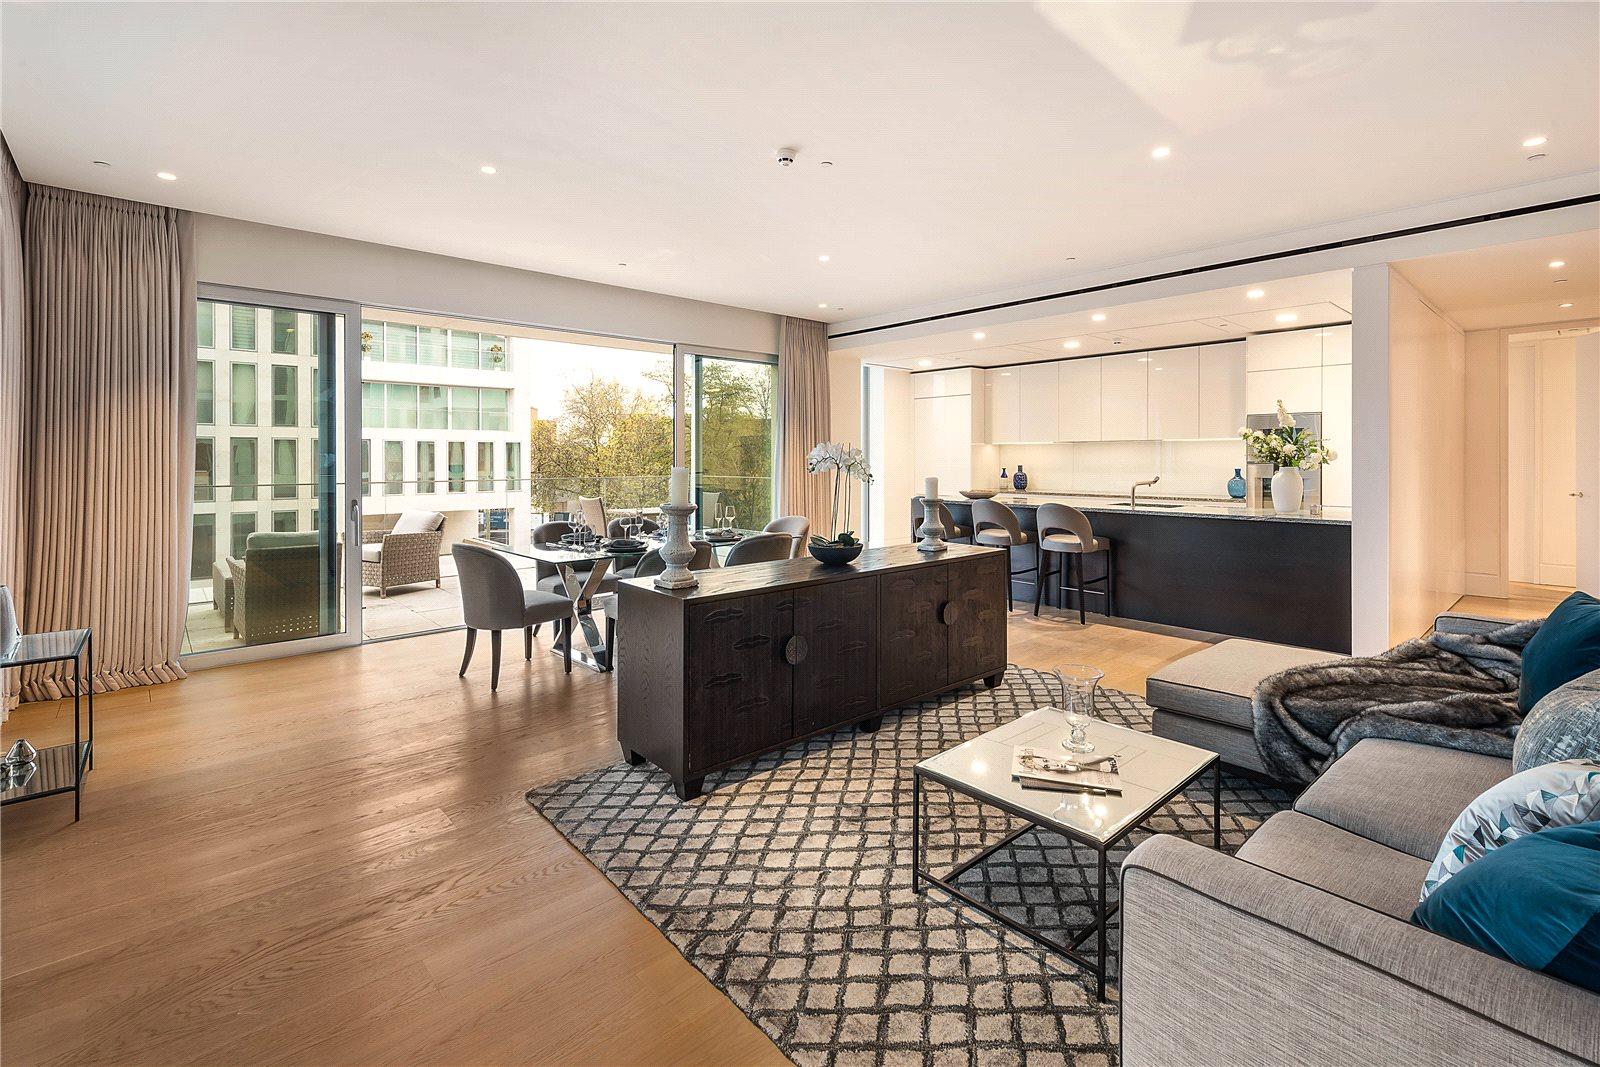 Apartamento por un Venta en Hollandgreen Place, Kensington, London, W8 Kensington, London, Inglaterra